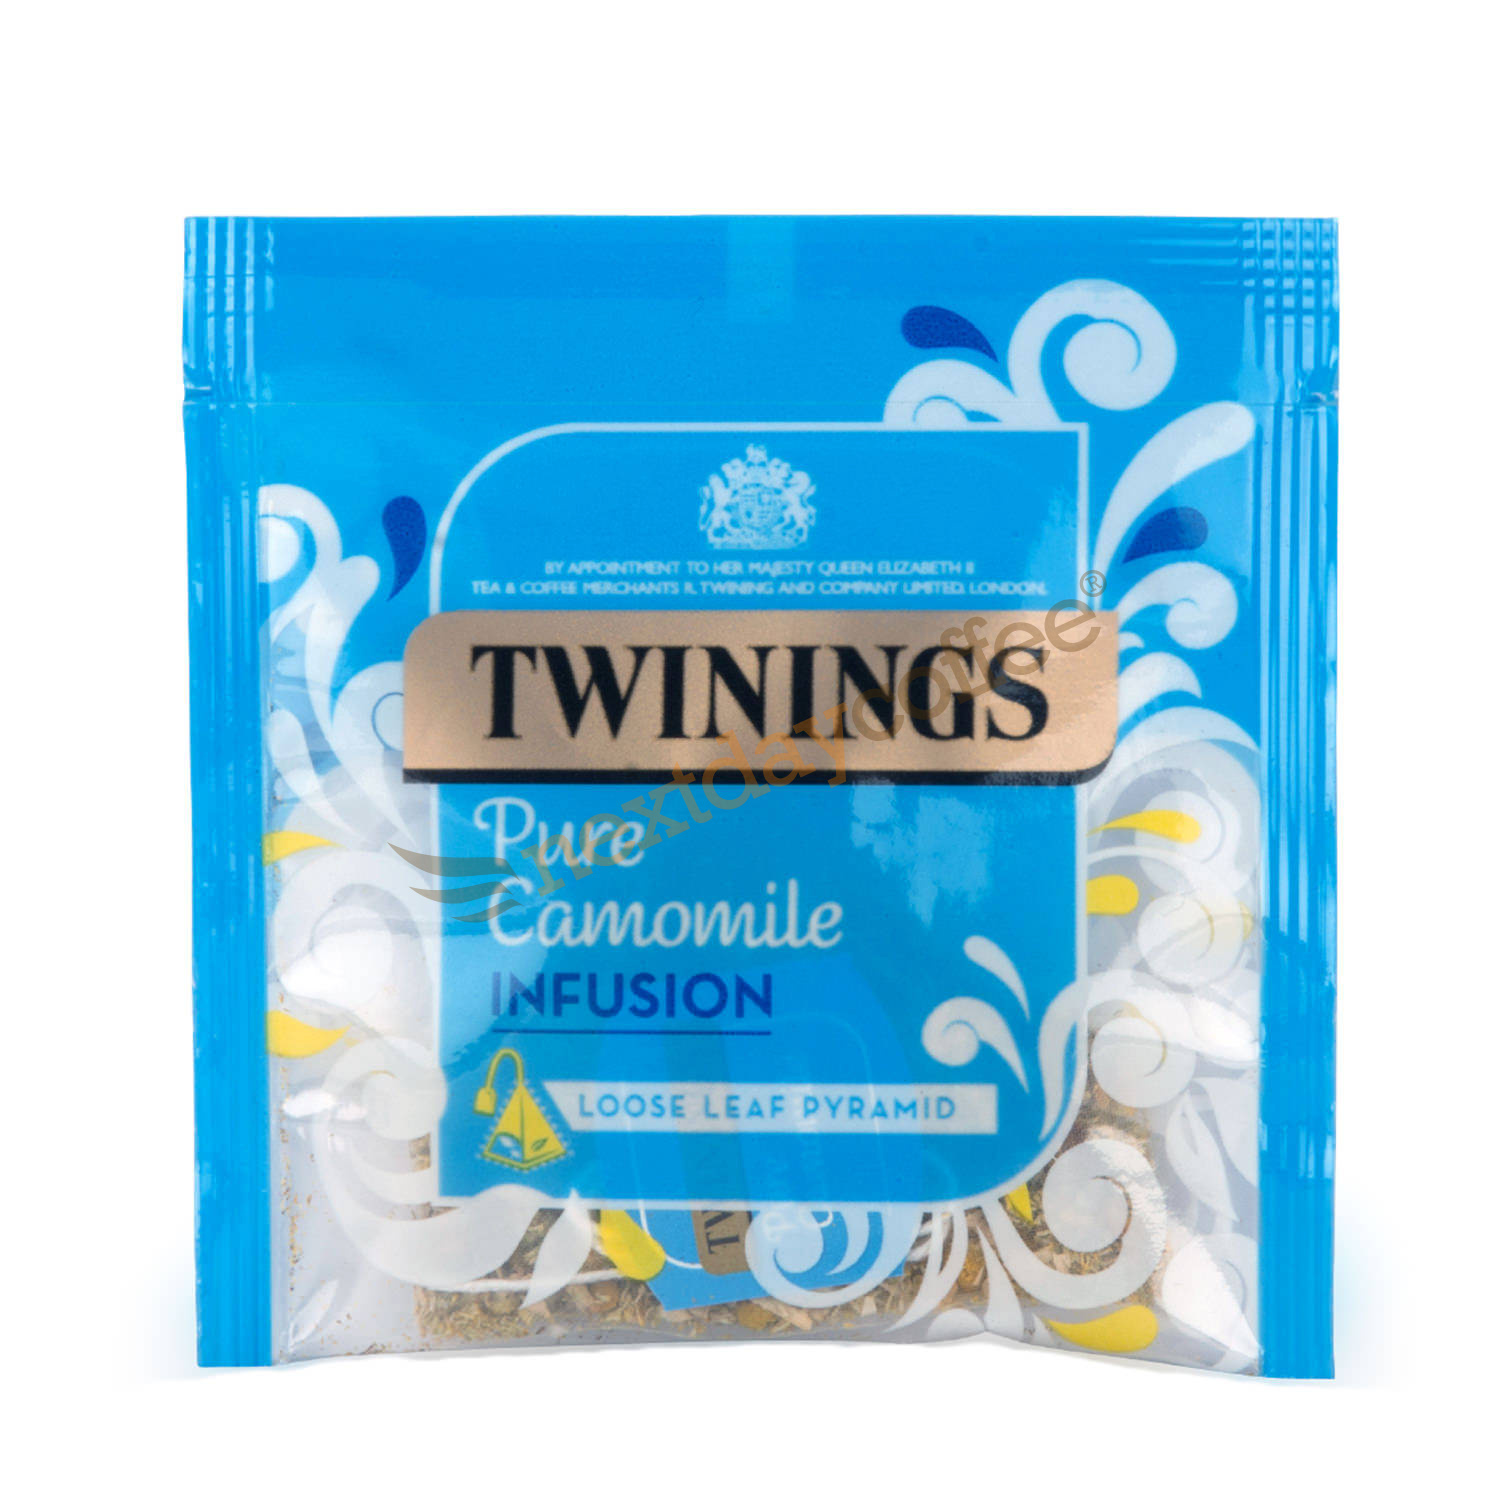 Twinings Pure Camomile